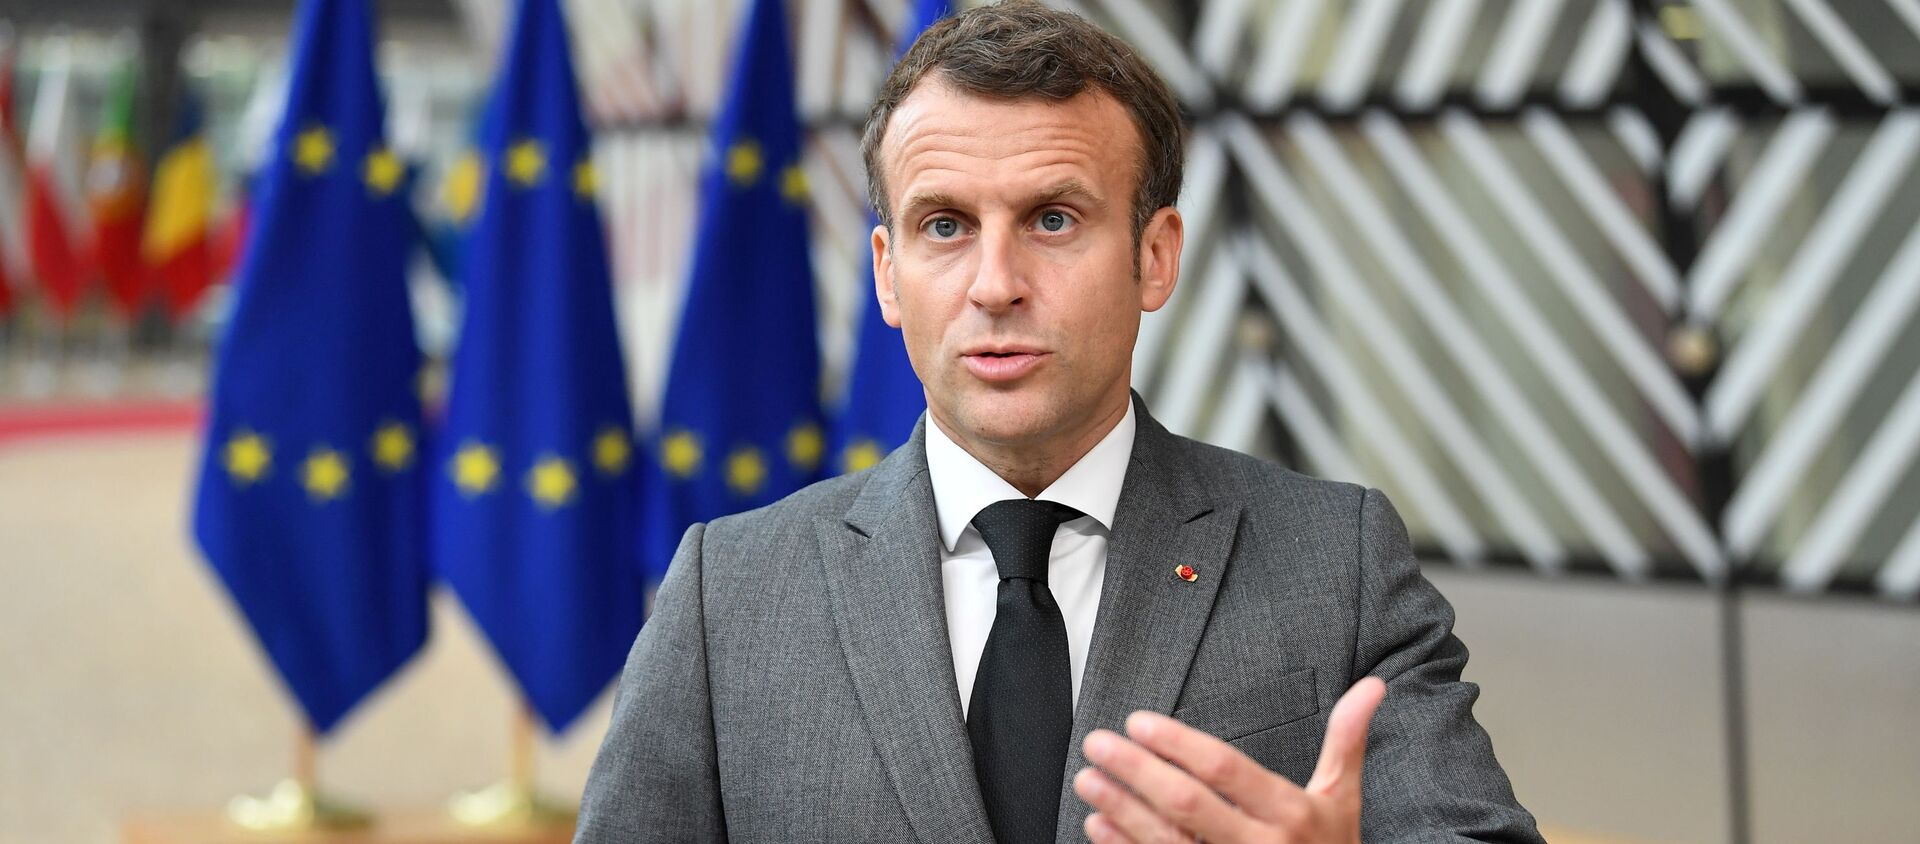 President Macron Orders Probes Into Pegasus Spyware Case, Prime Minister Castex Says - Sputnik International, 1920, 21.07.2021